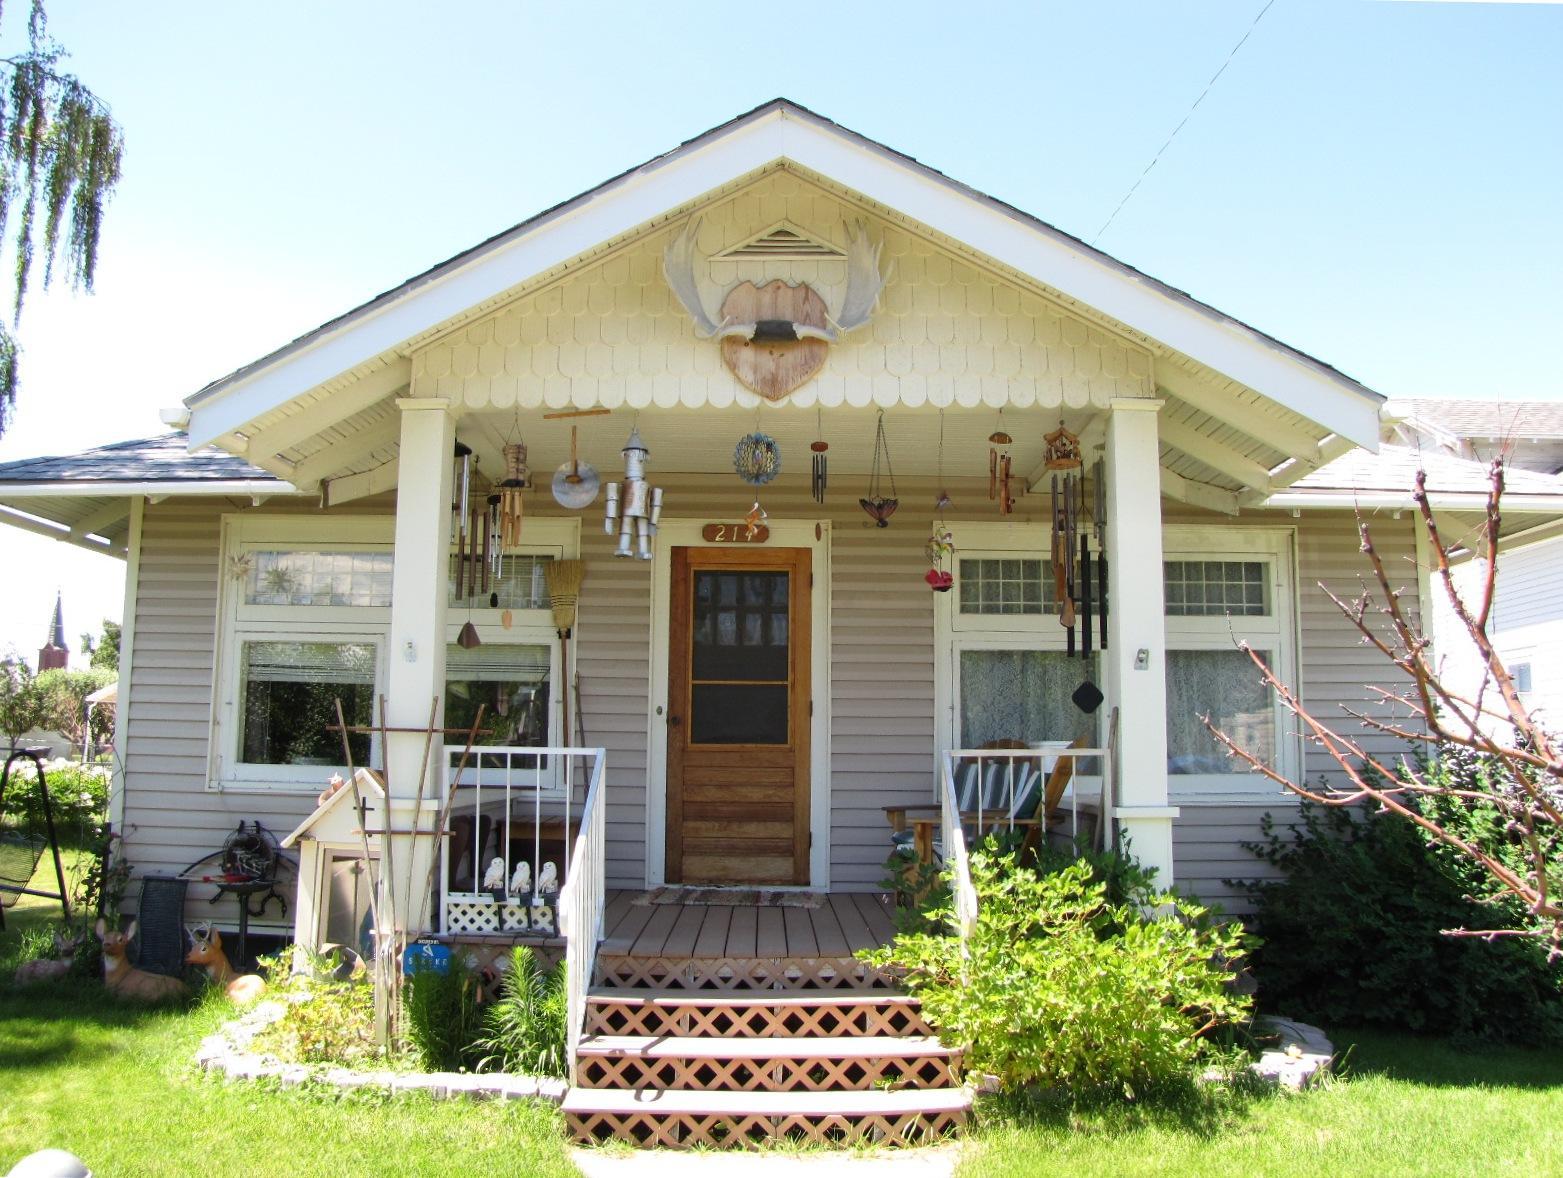 214 Fifth Street, Deer Lodge, MT 59722